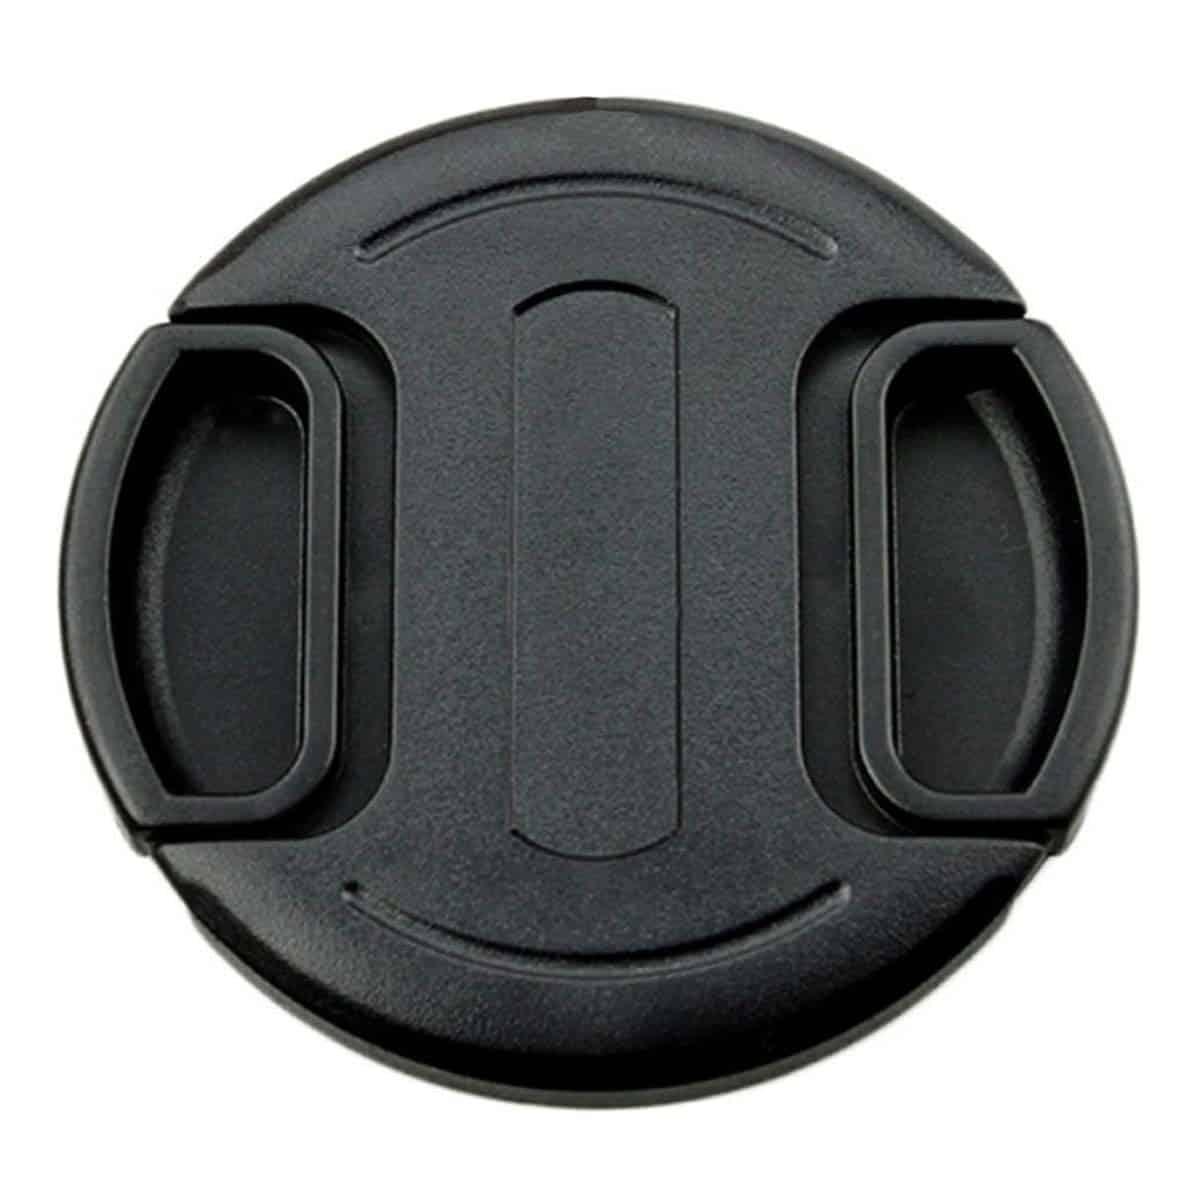 Tapa delantera objetivo JCC de 40,5 mm